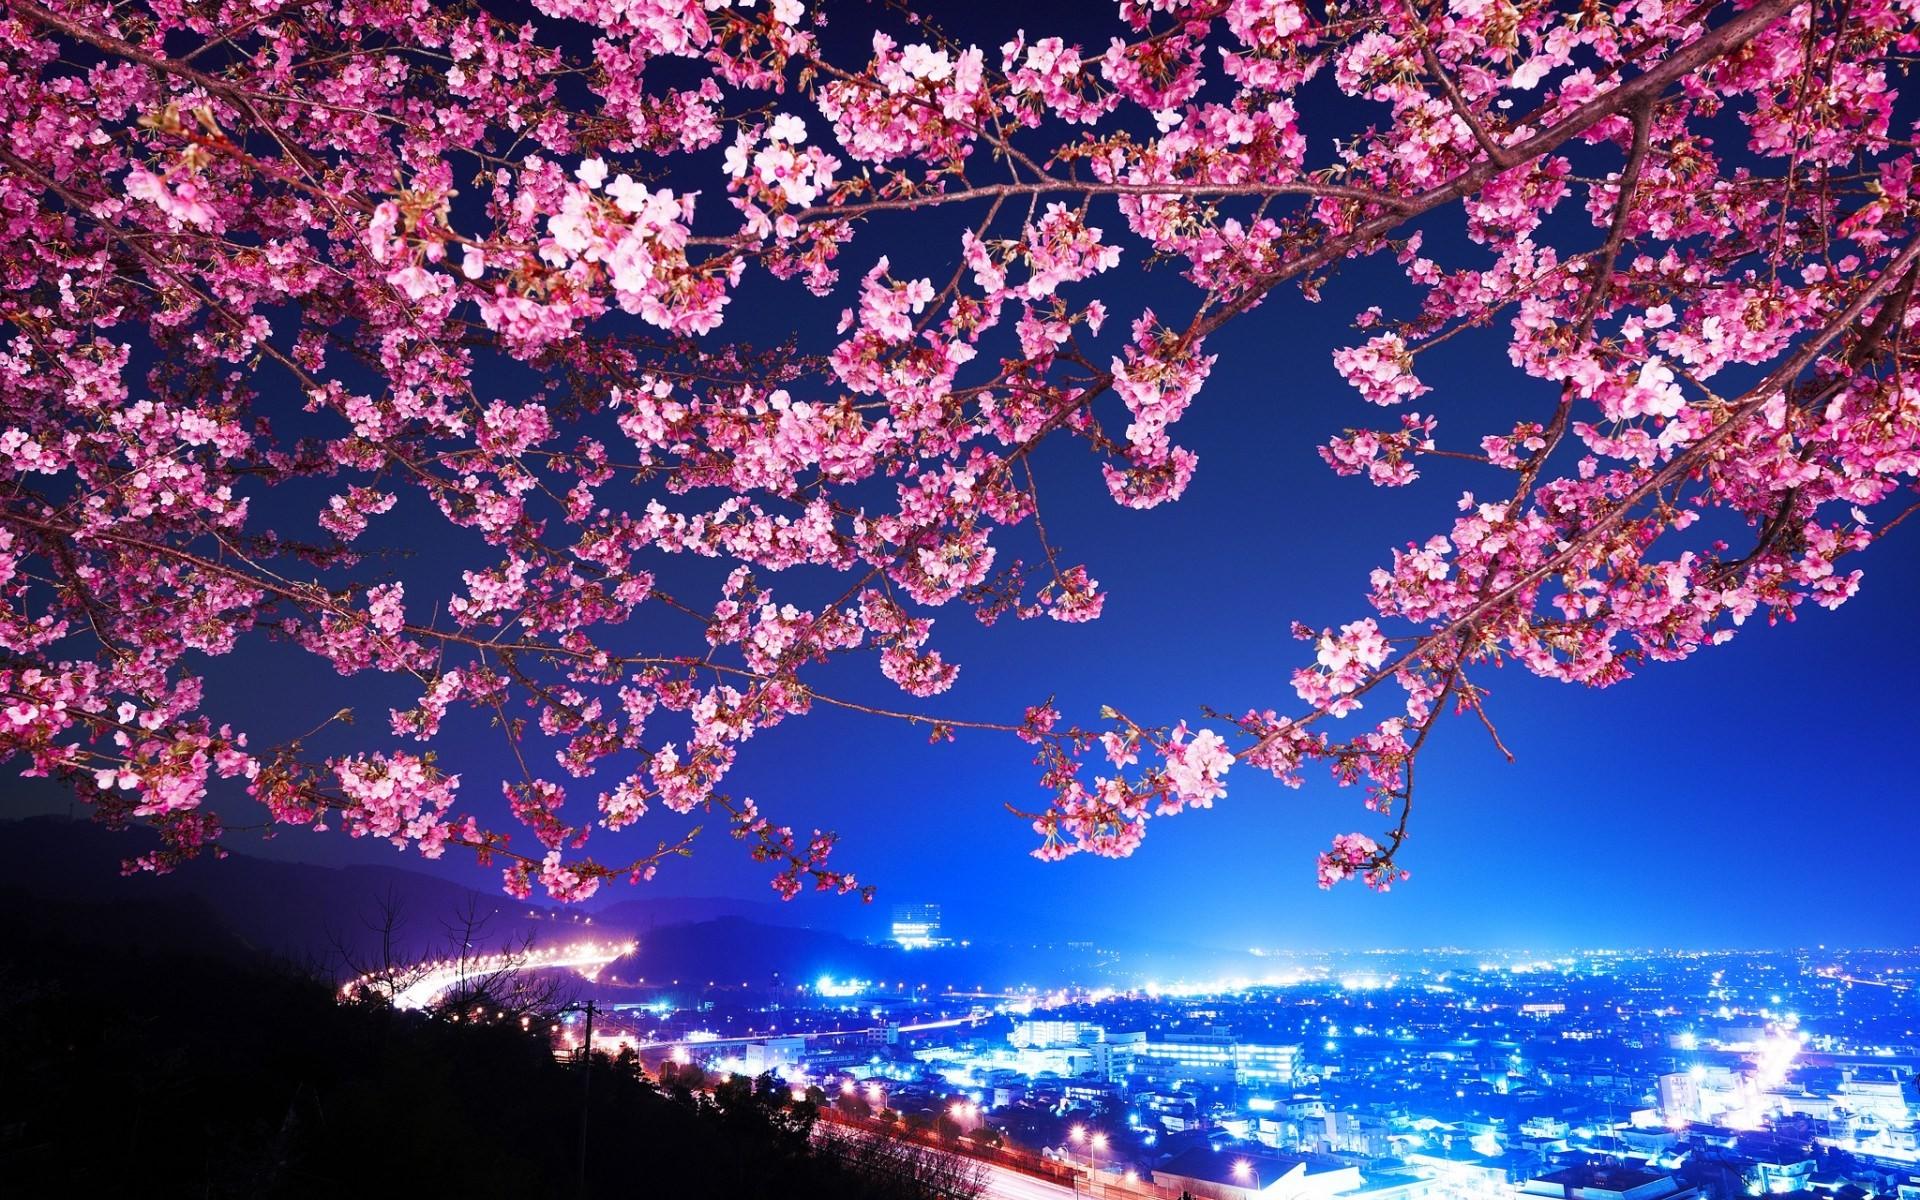 Drawn Cherry Blossom Desktop Wallpaper